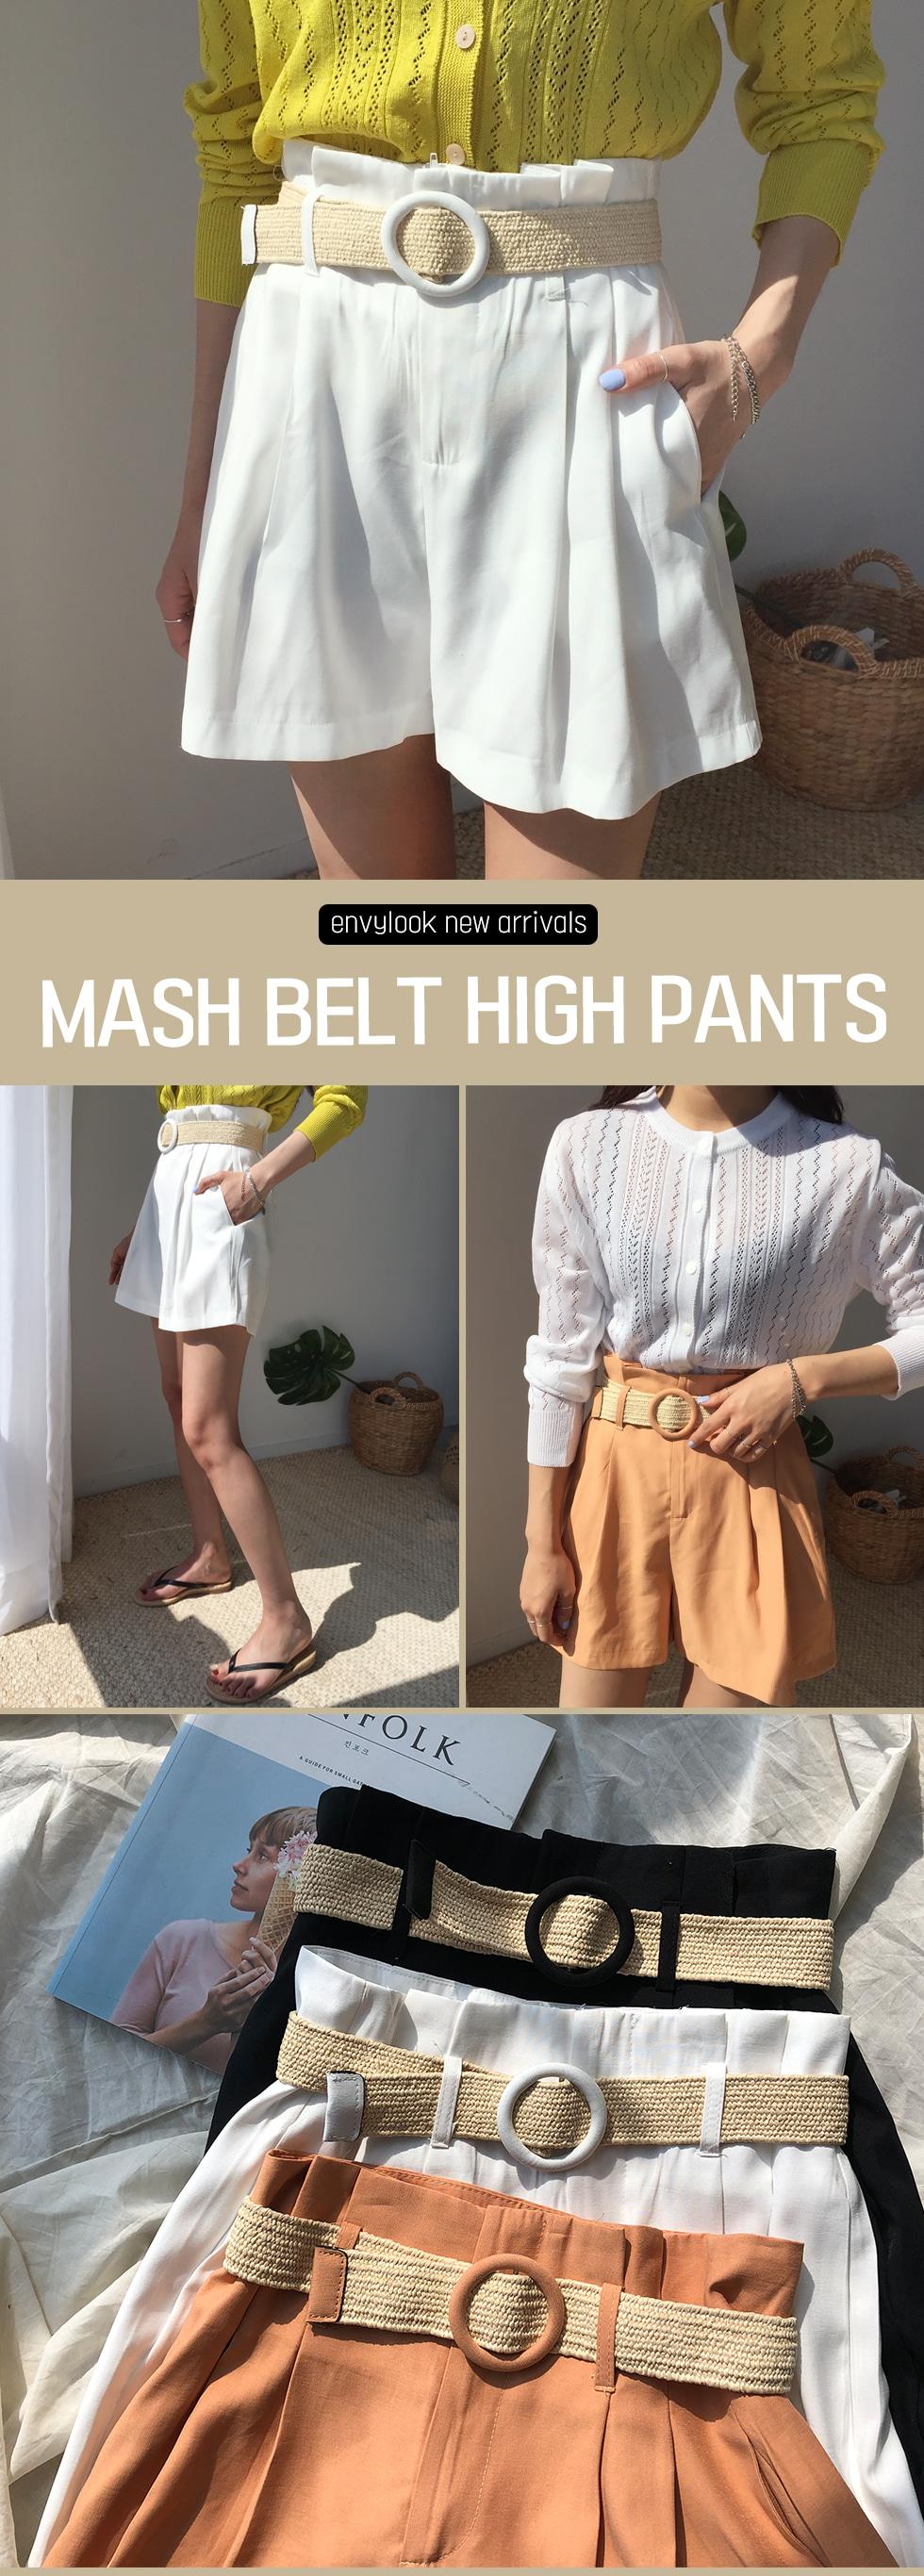 Mesh belt high half pants